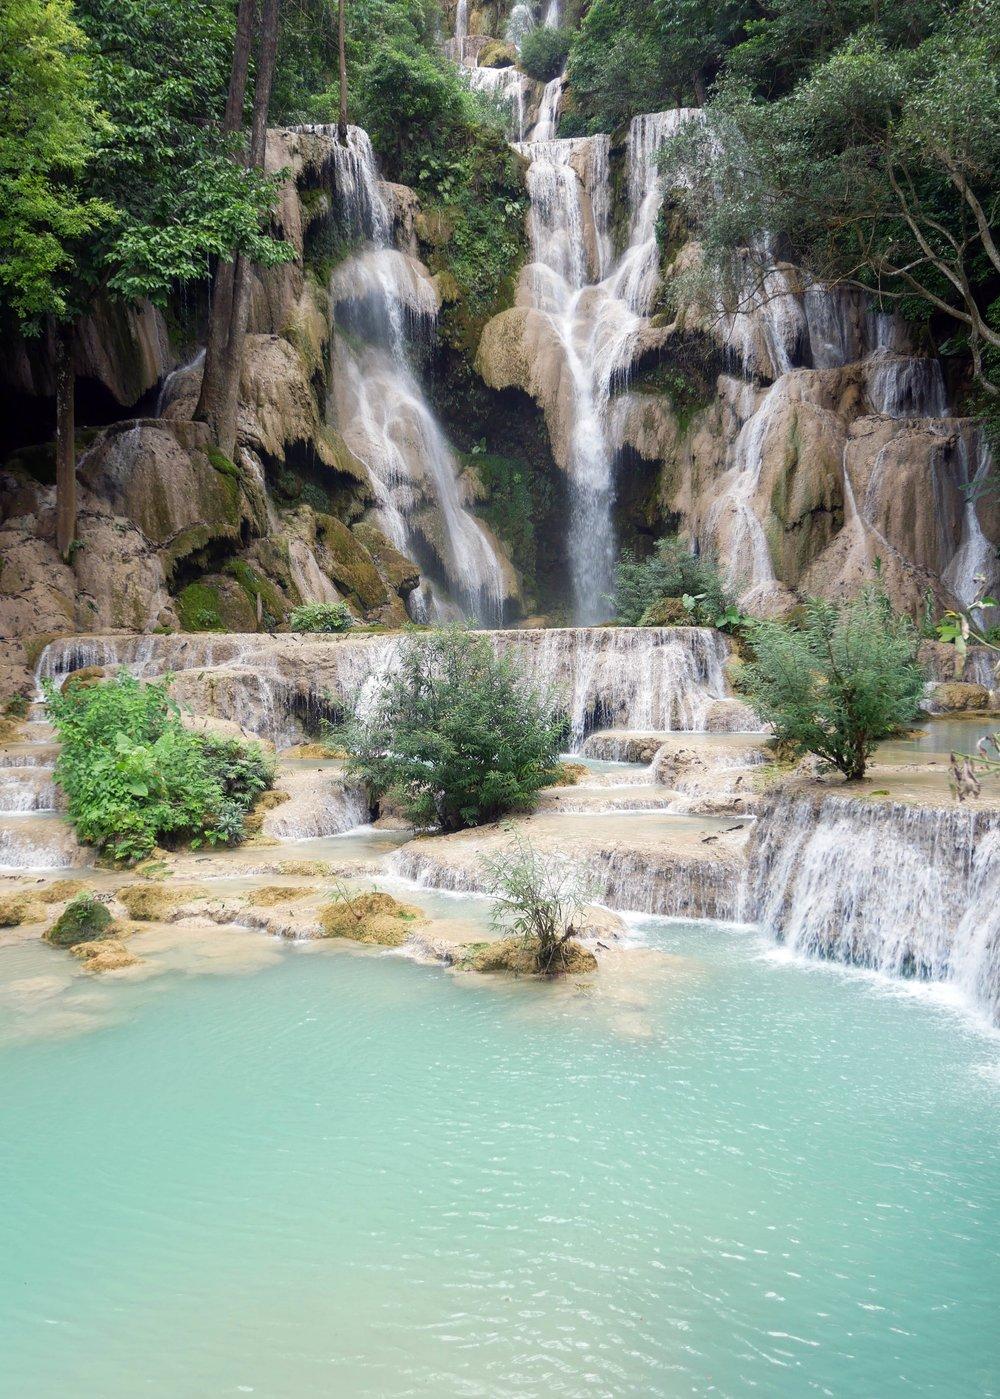 Kuang Si Falls are simply glorious